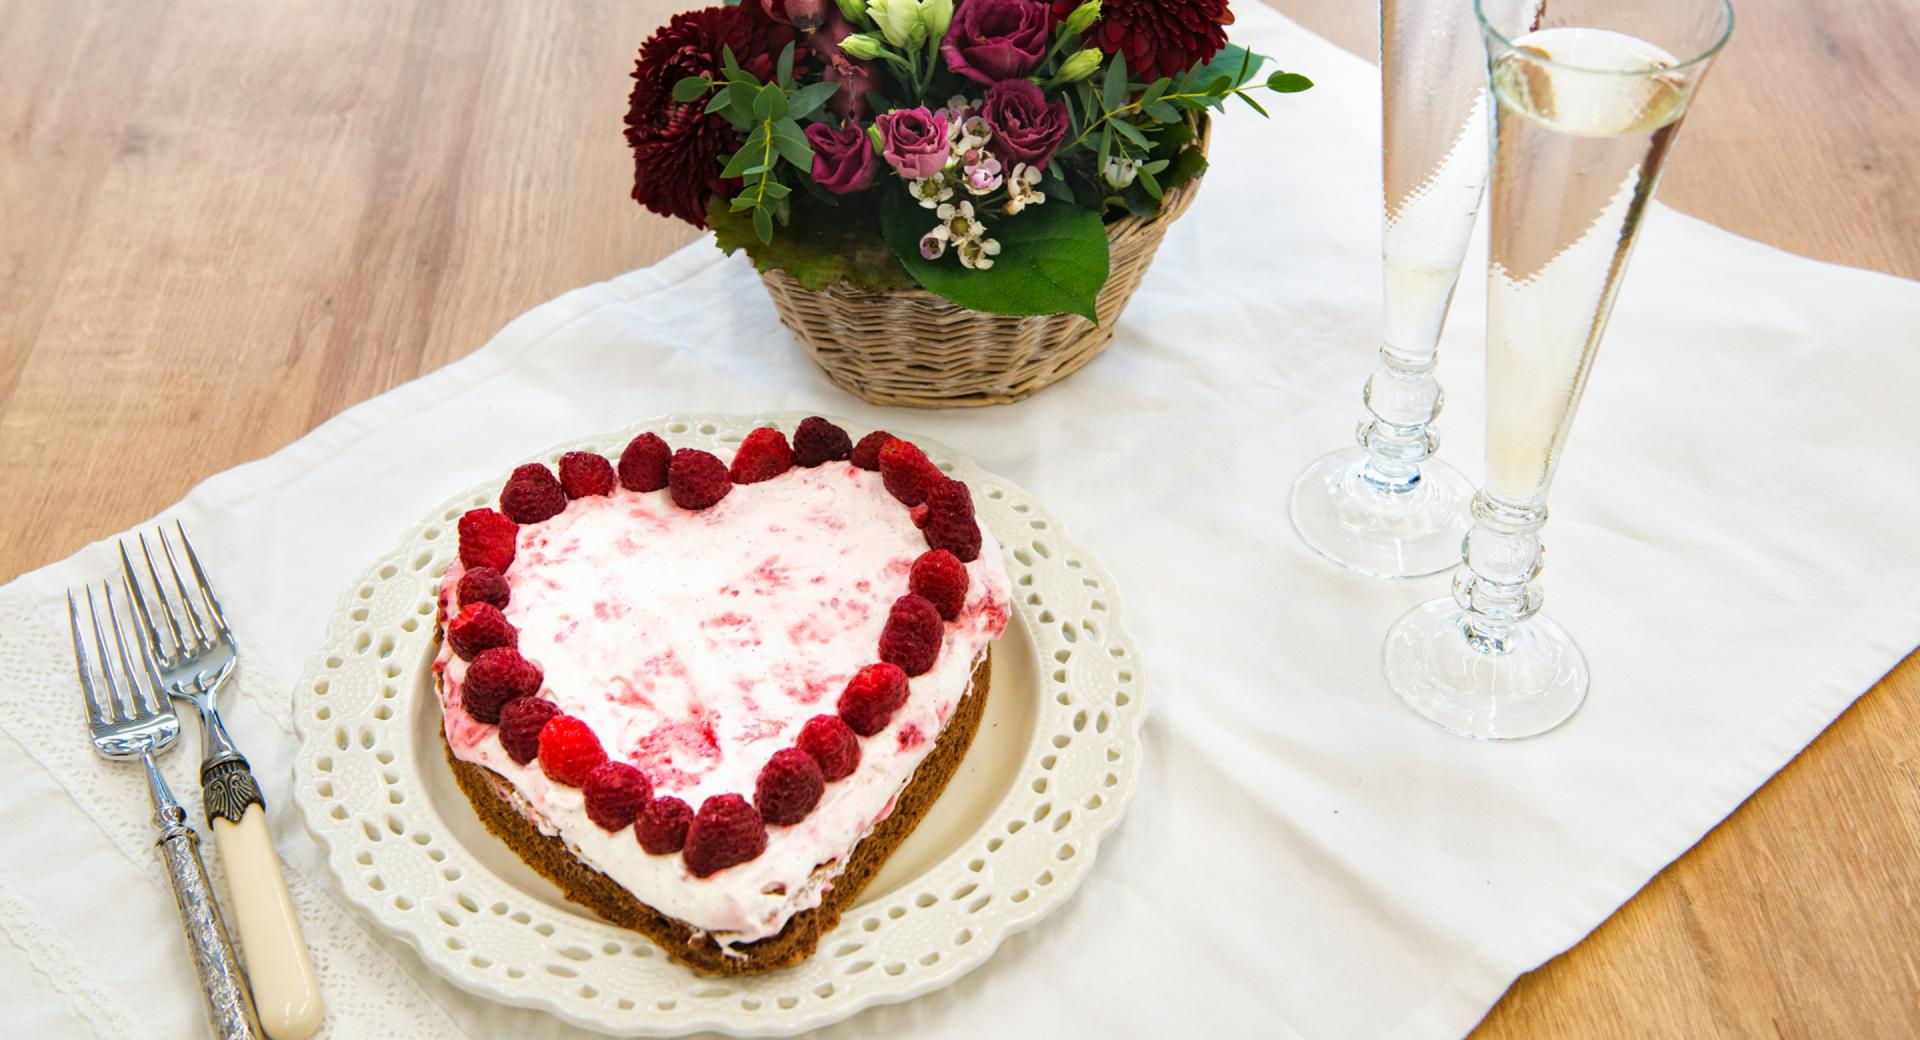 Corazón de chocolate con frambuesa